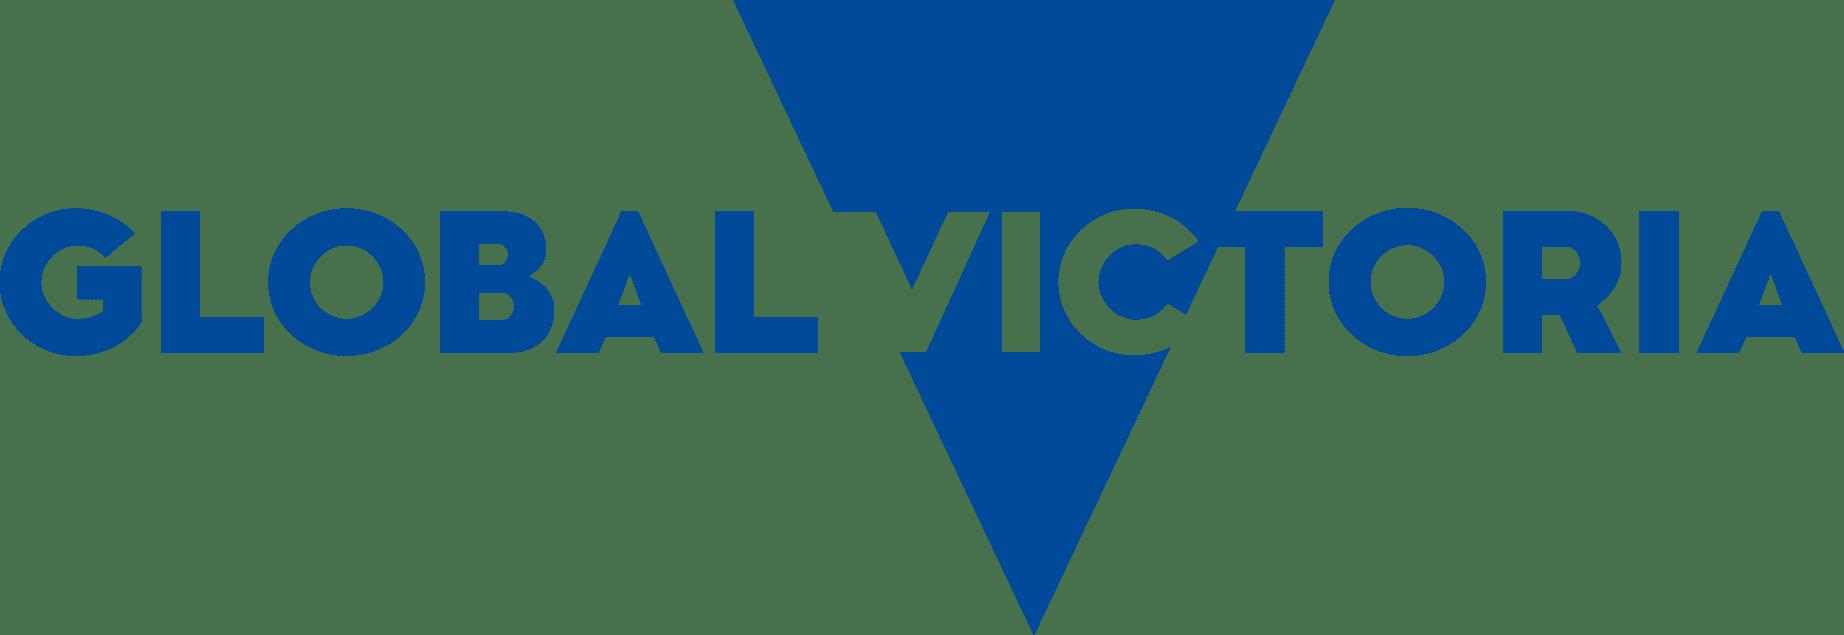 12026-DJPR-Global-Victoria-Logo_PMS-1